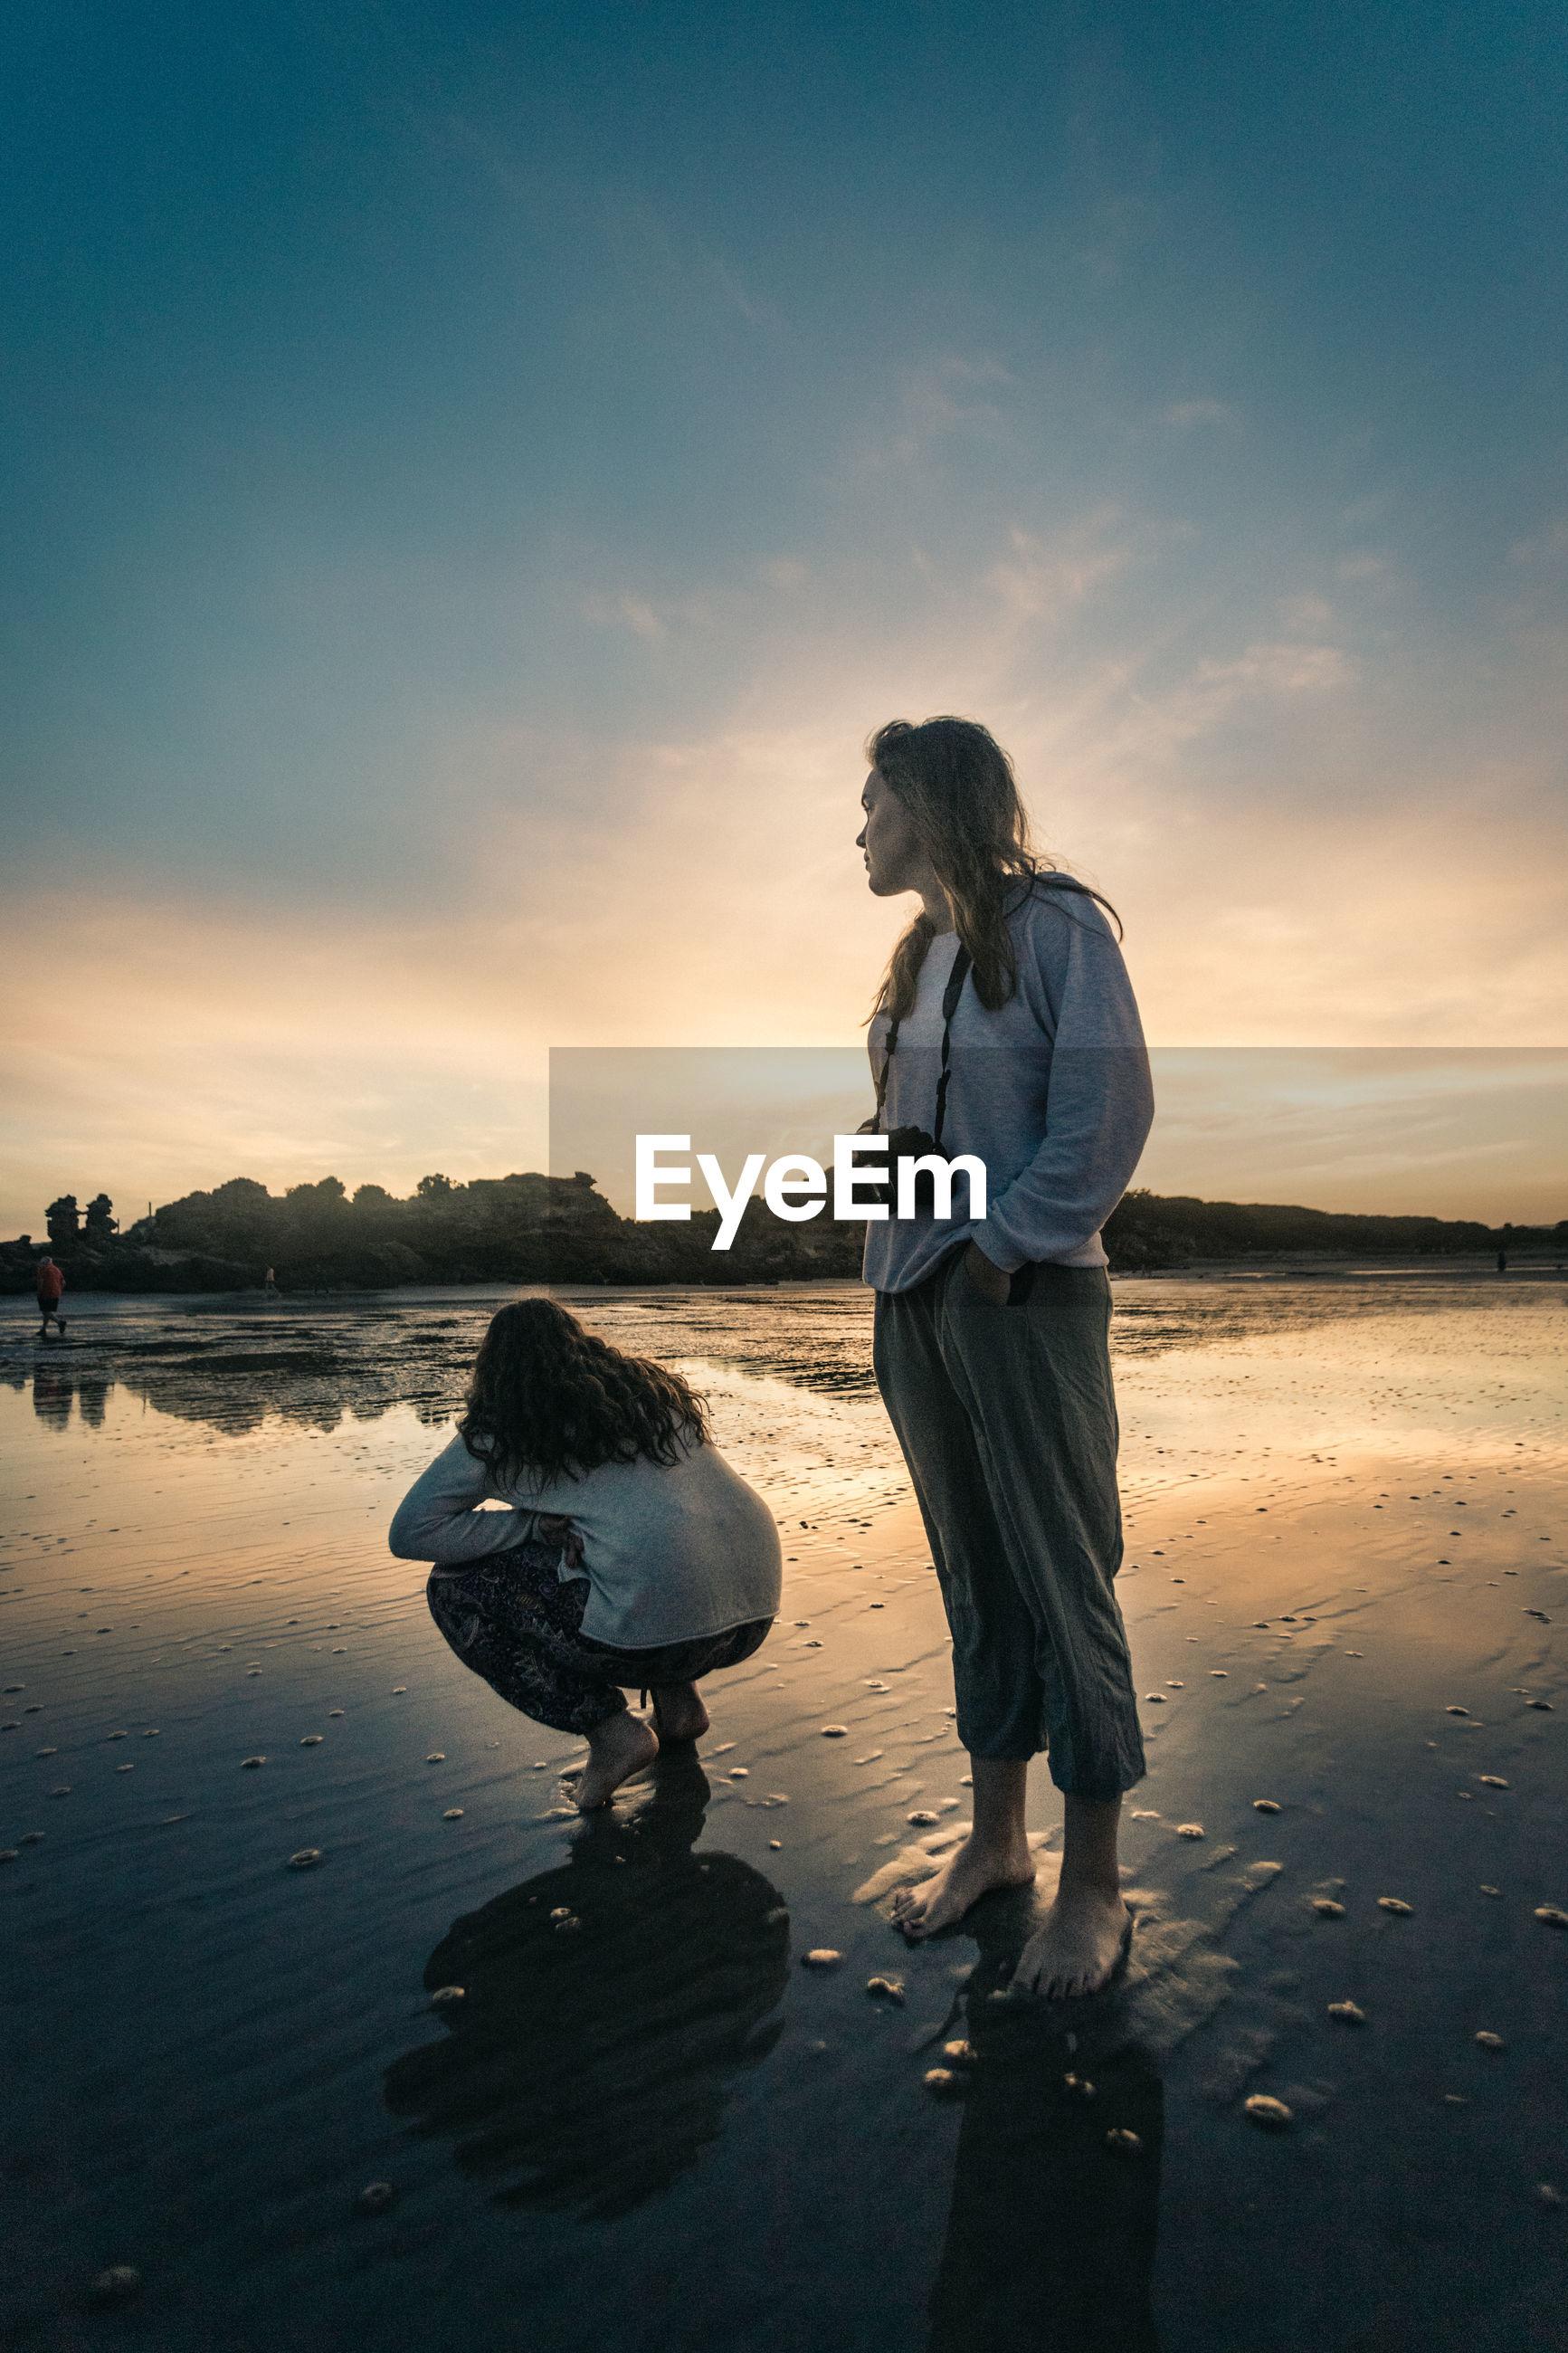 FRIENDS ENJOYING ON BEACH AGAINST SKY DURING SUNSET